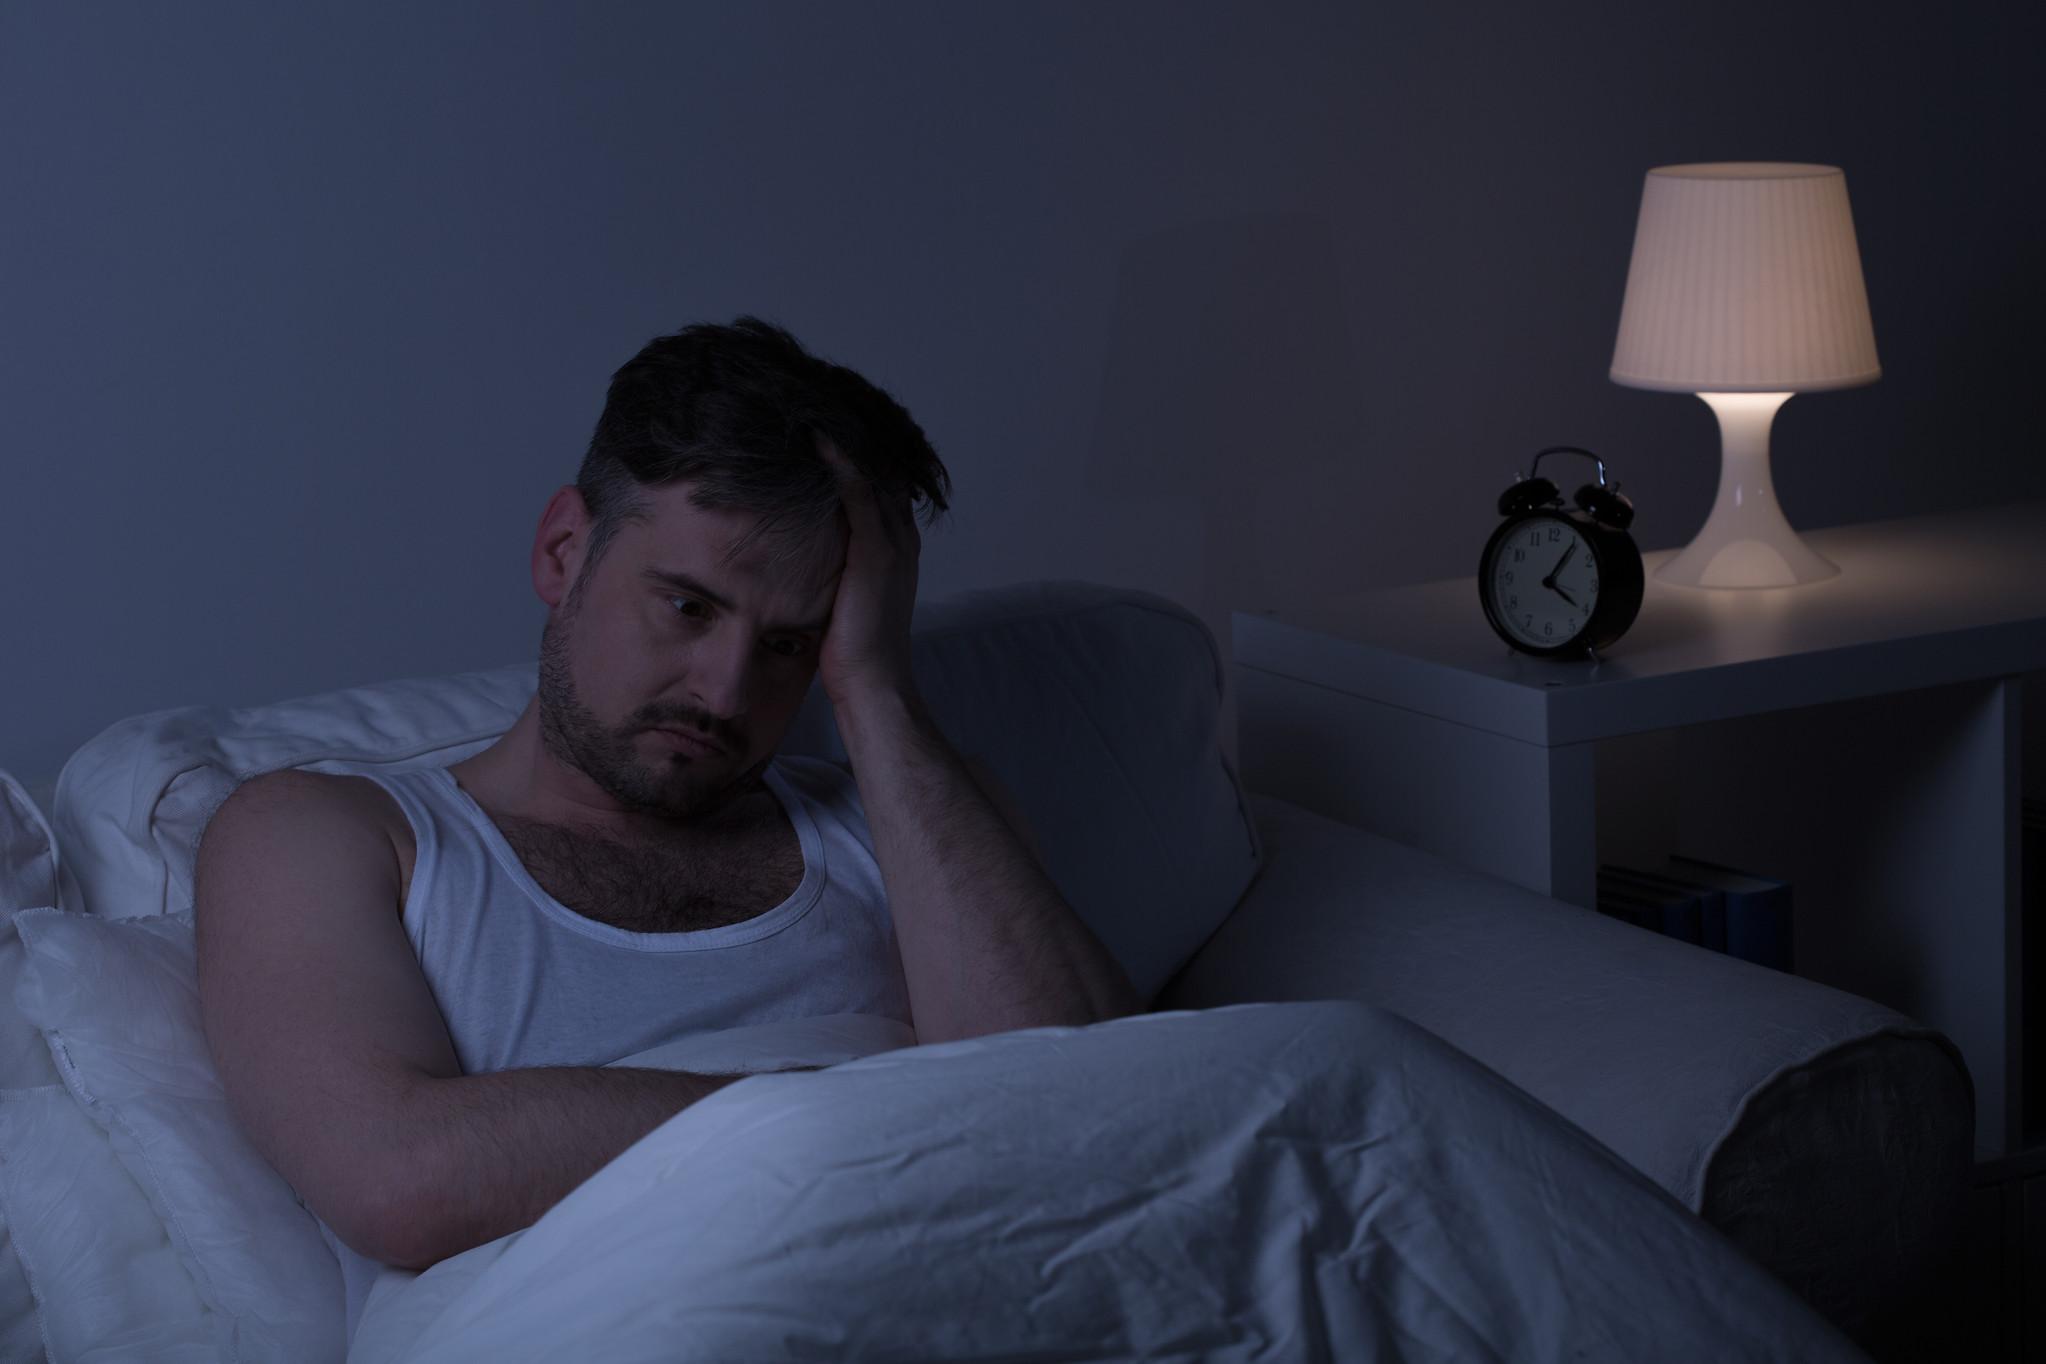 Man suffering from sleeplessness sitting